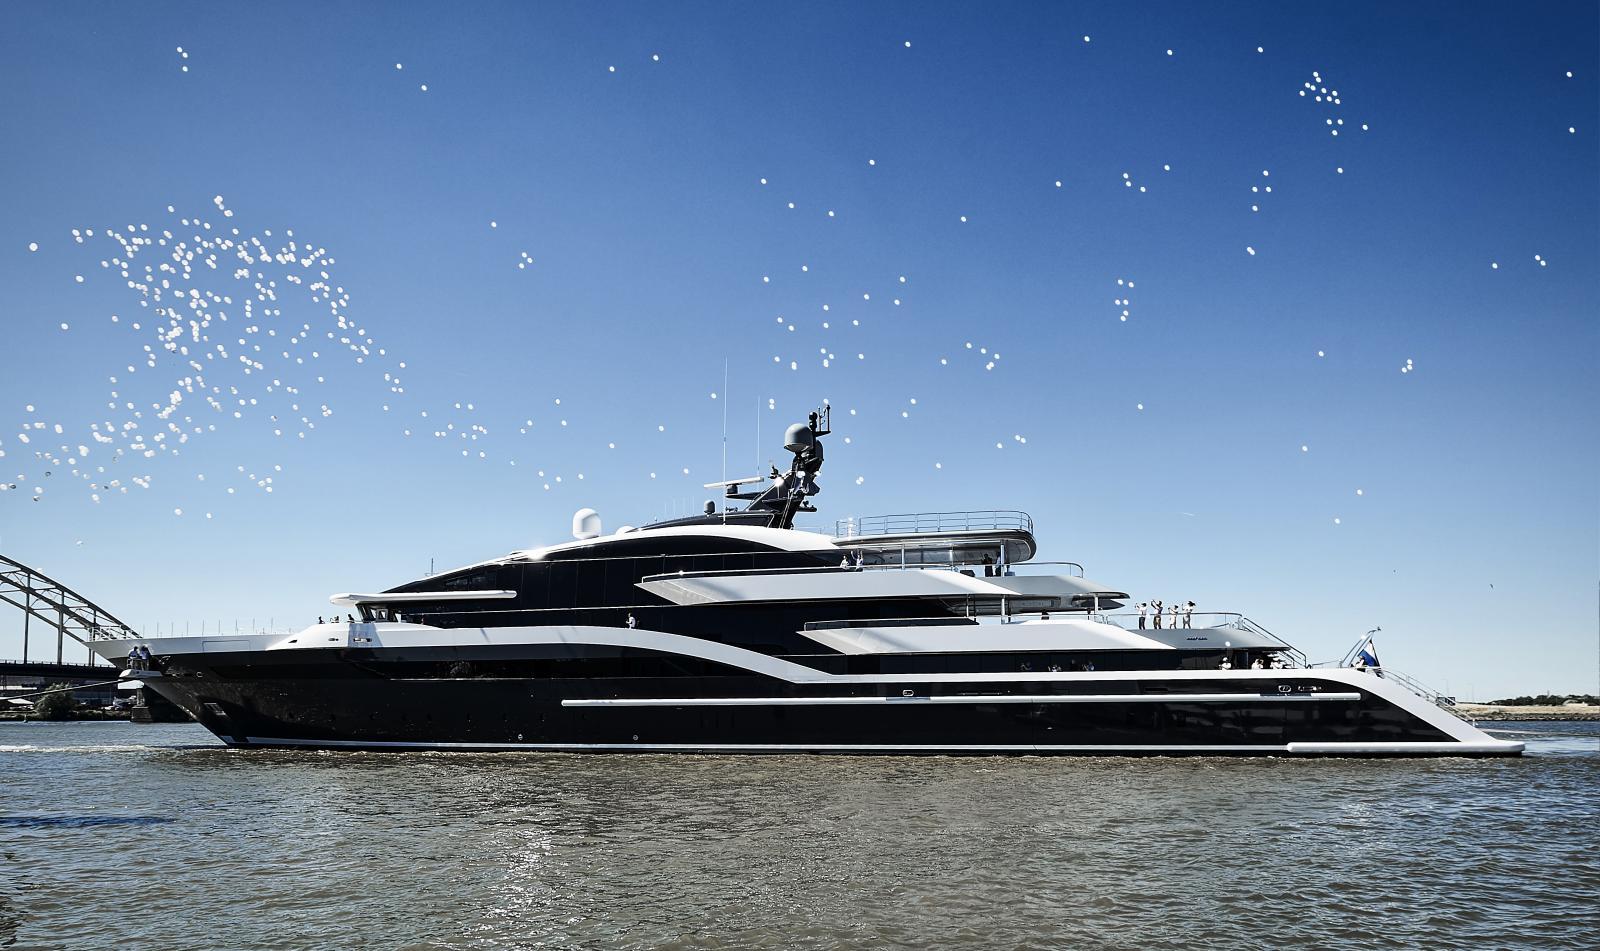 Oceanco Superyacht 90M (295 ft.)